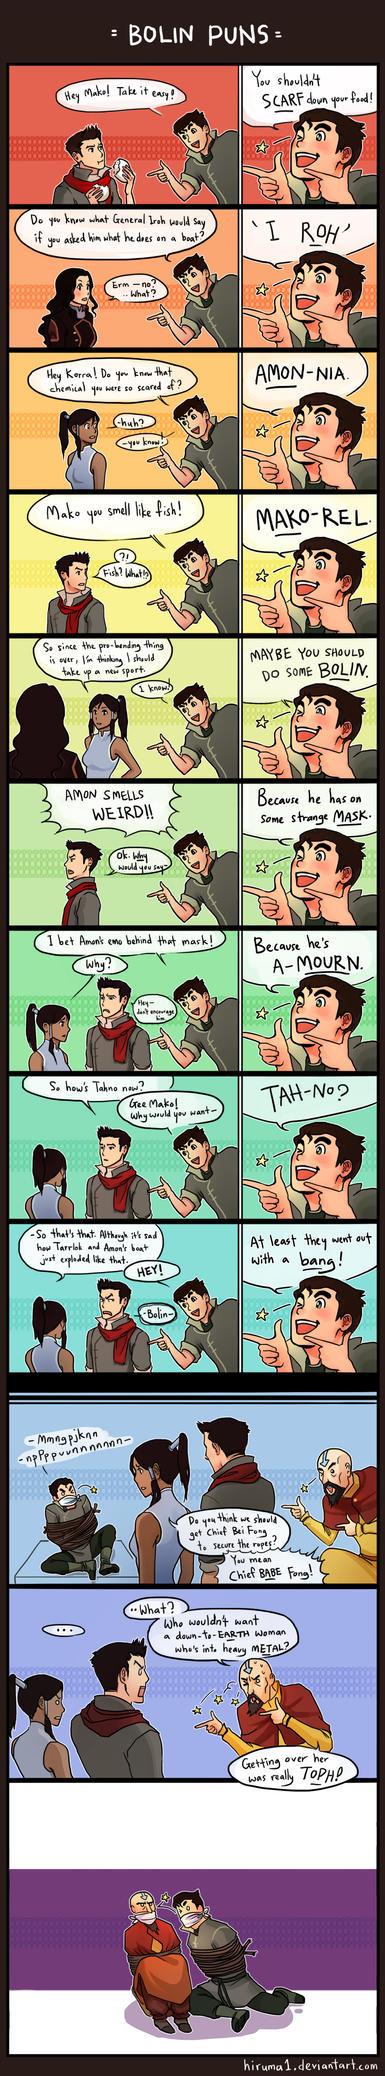 LOK- Bolin puns by lydia-the-hobo